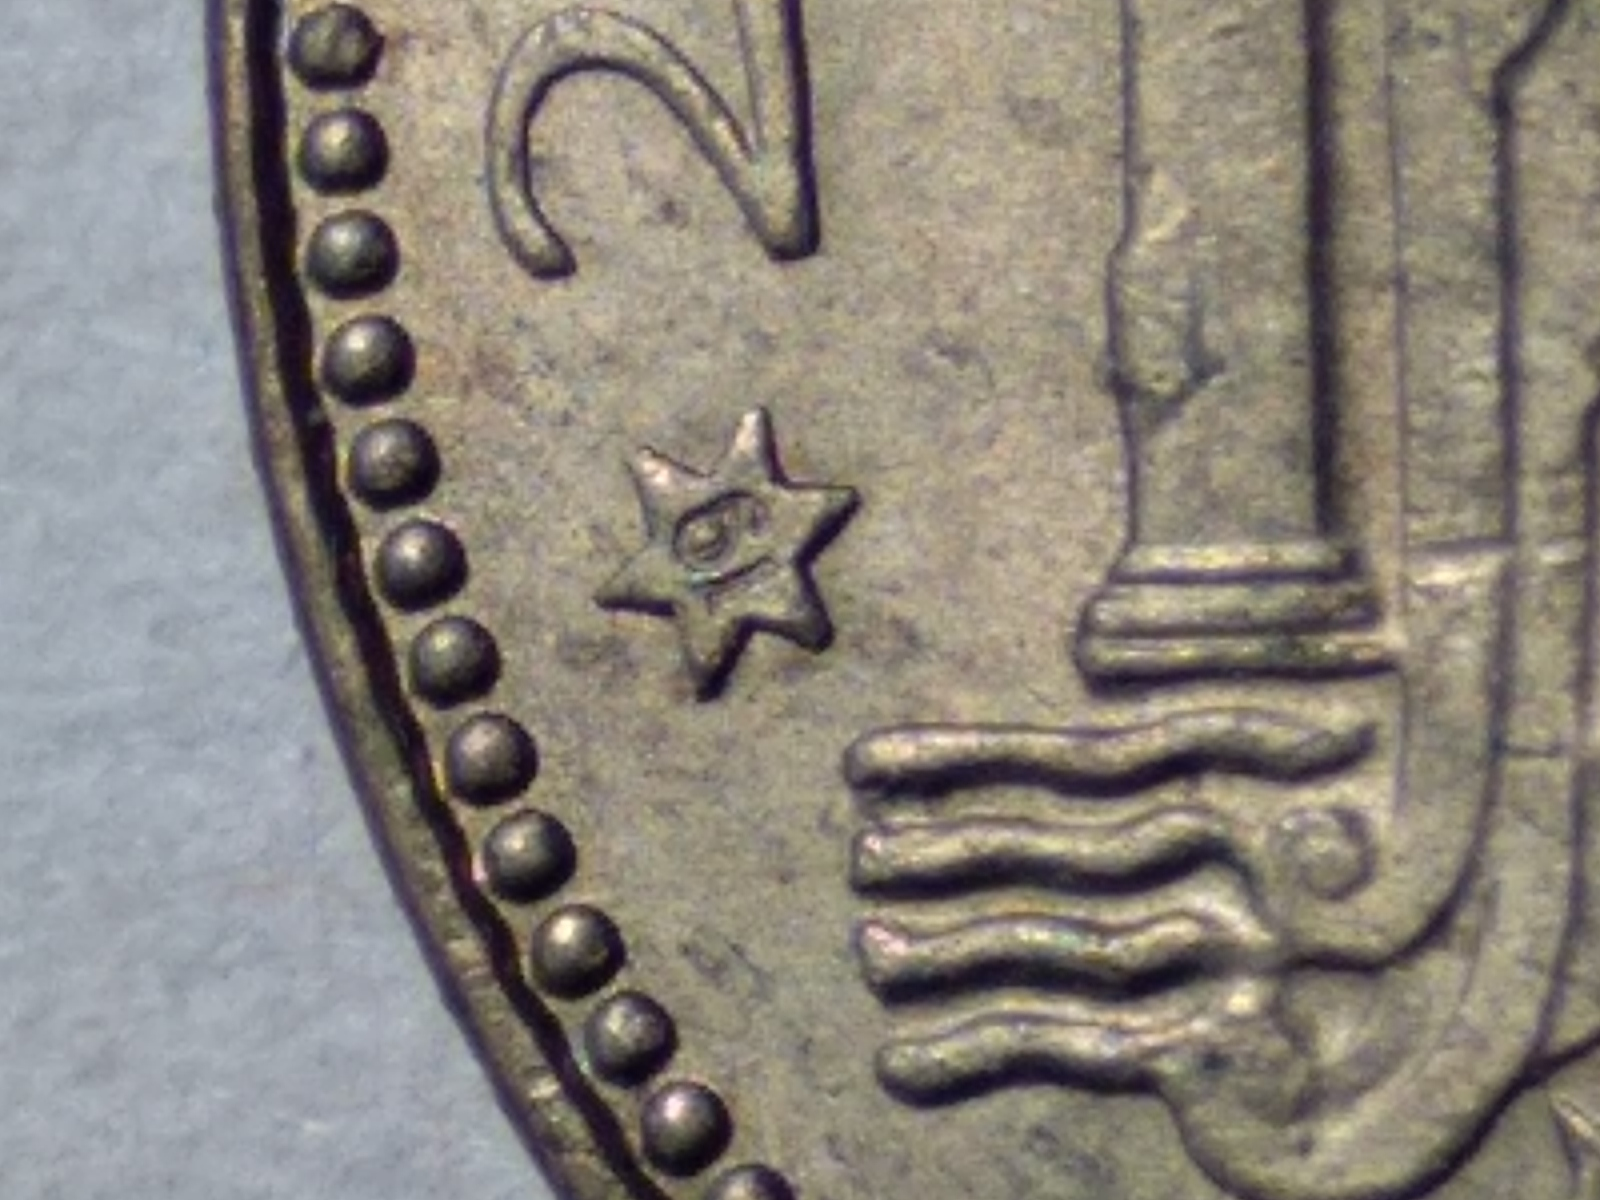 2,50 pesetas (*19-71). Estado Español. Procedente de la tira 30ue04g